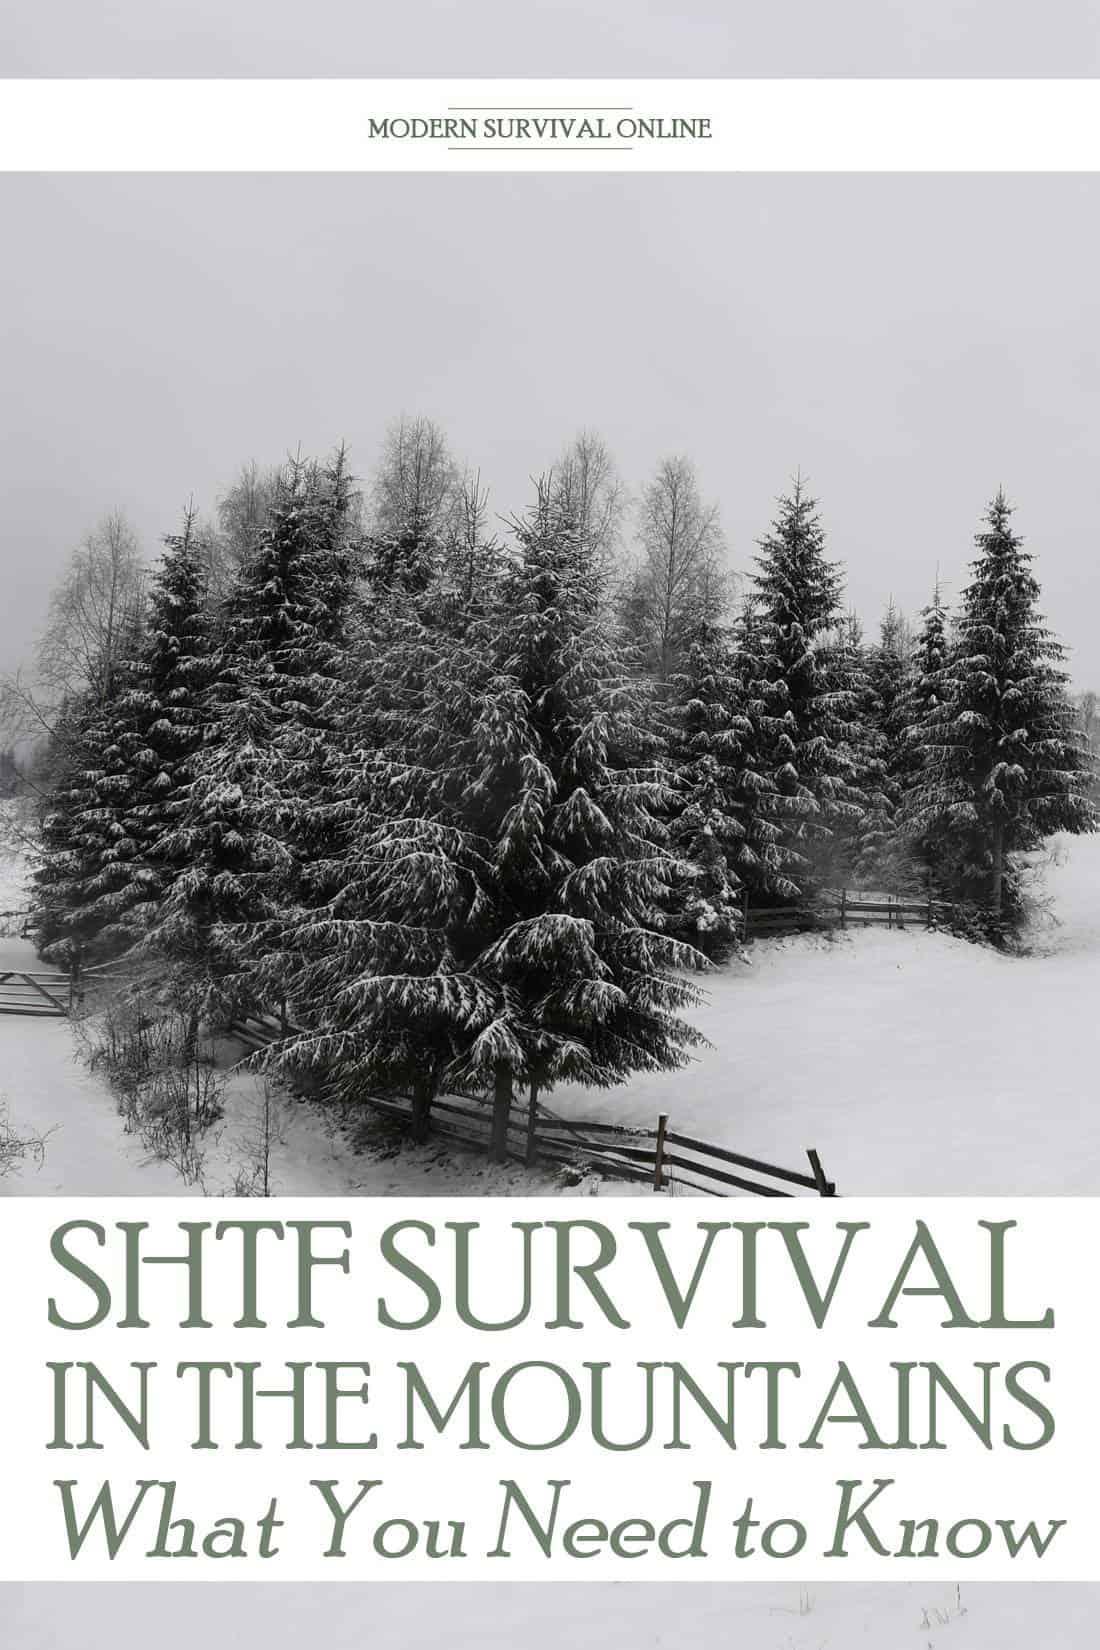 mountain survival pinterest image